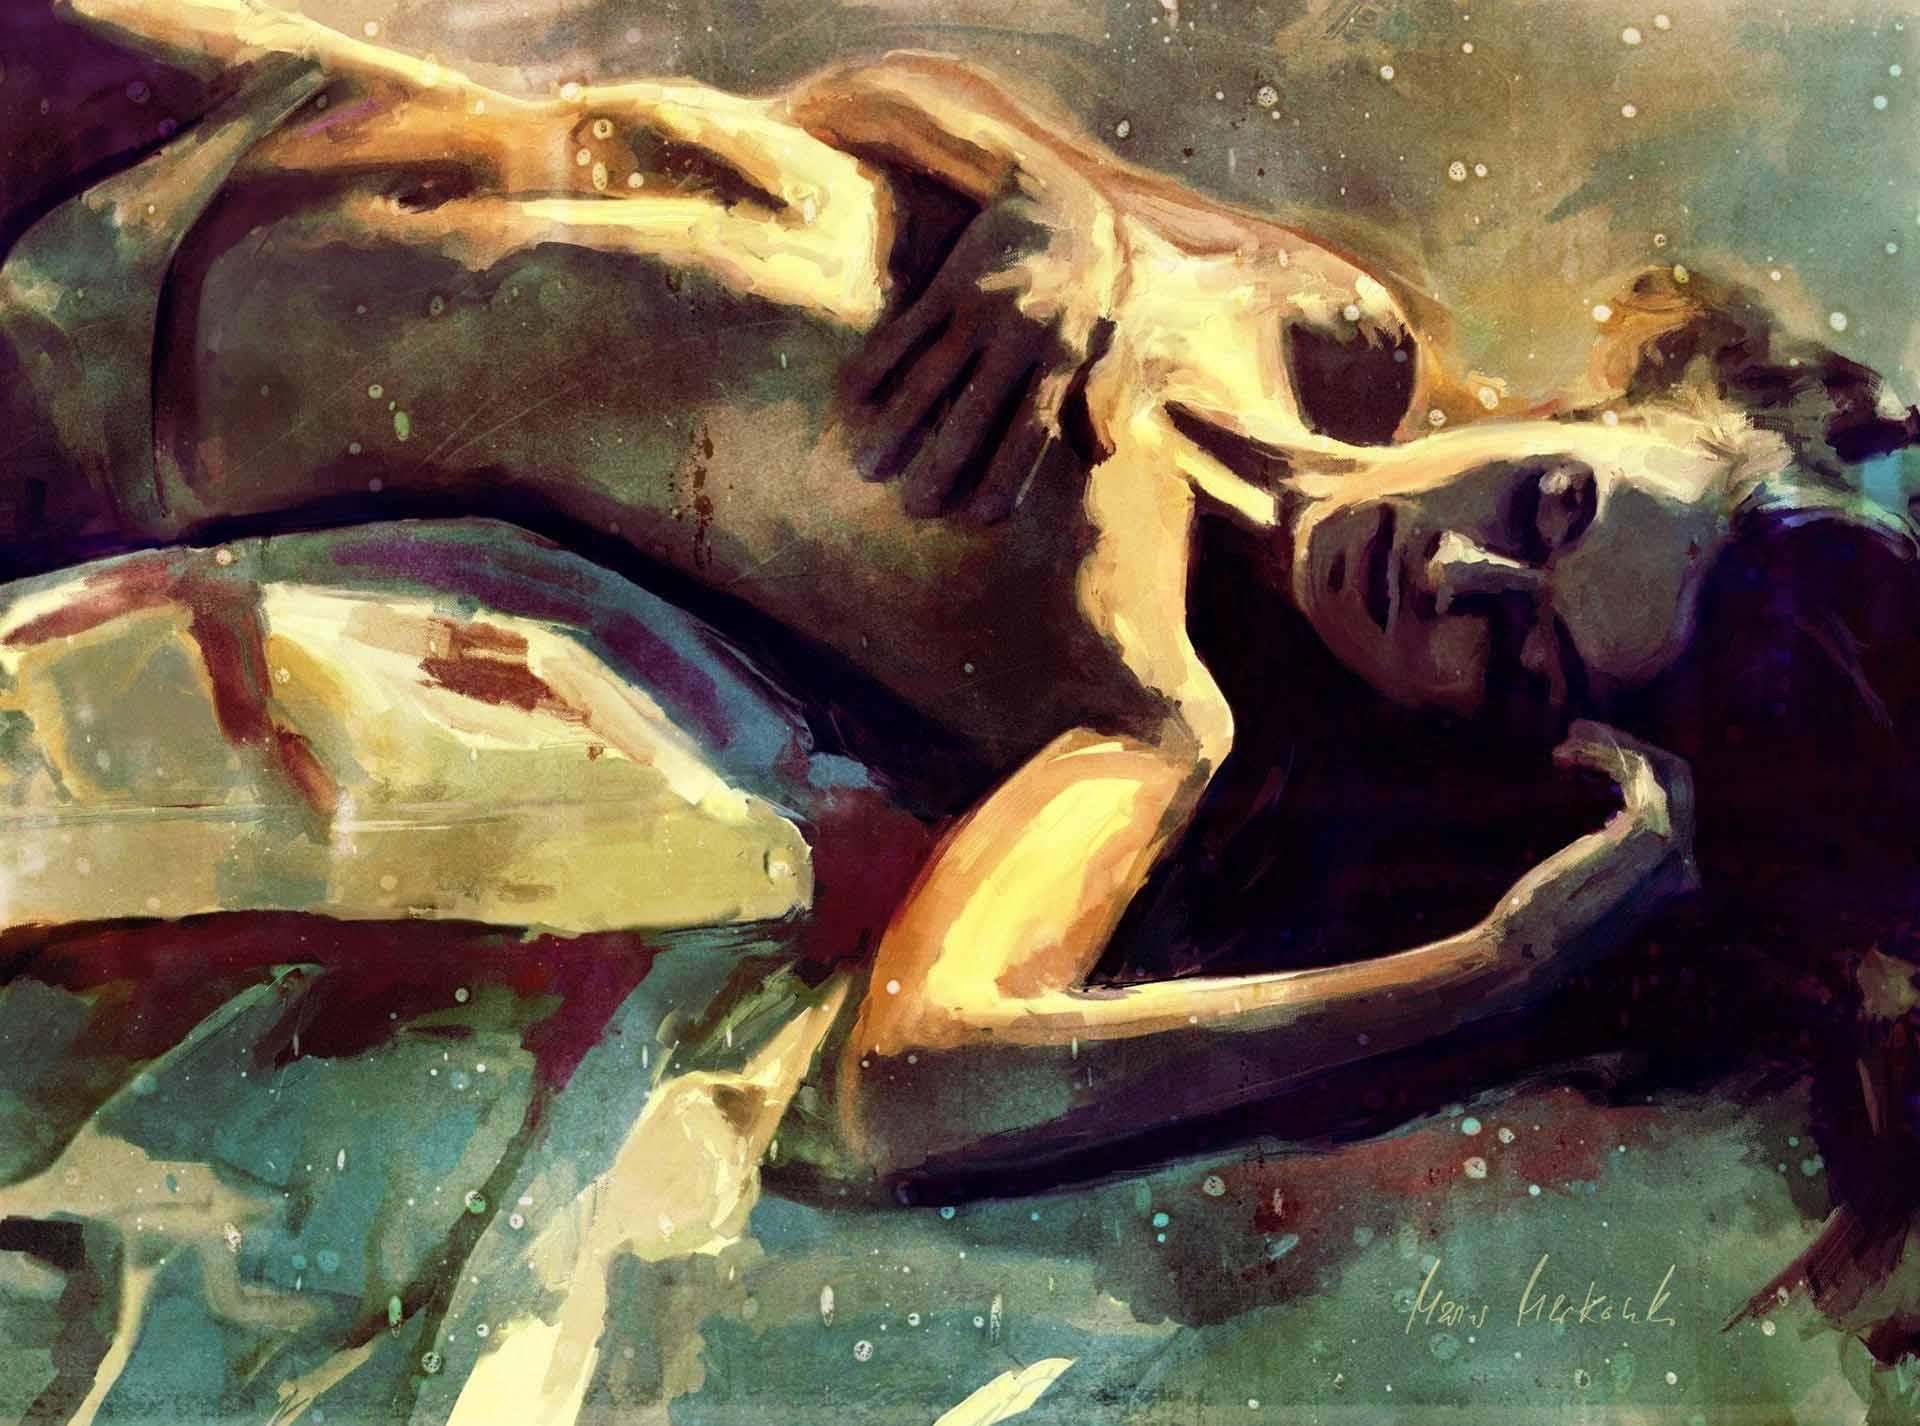 Мариус Марковски (Marius Markowski), Digital Paintings – 22